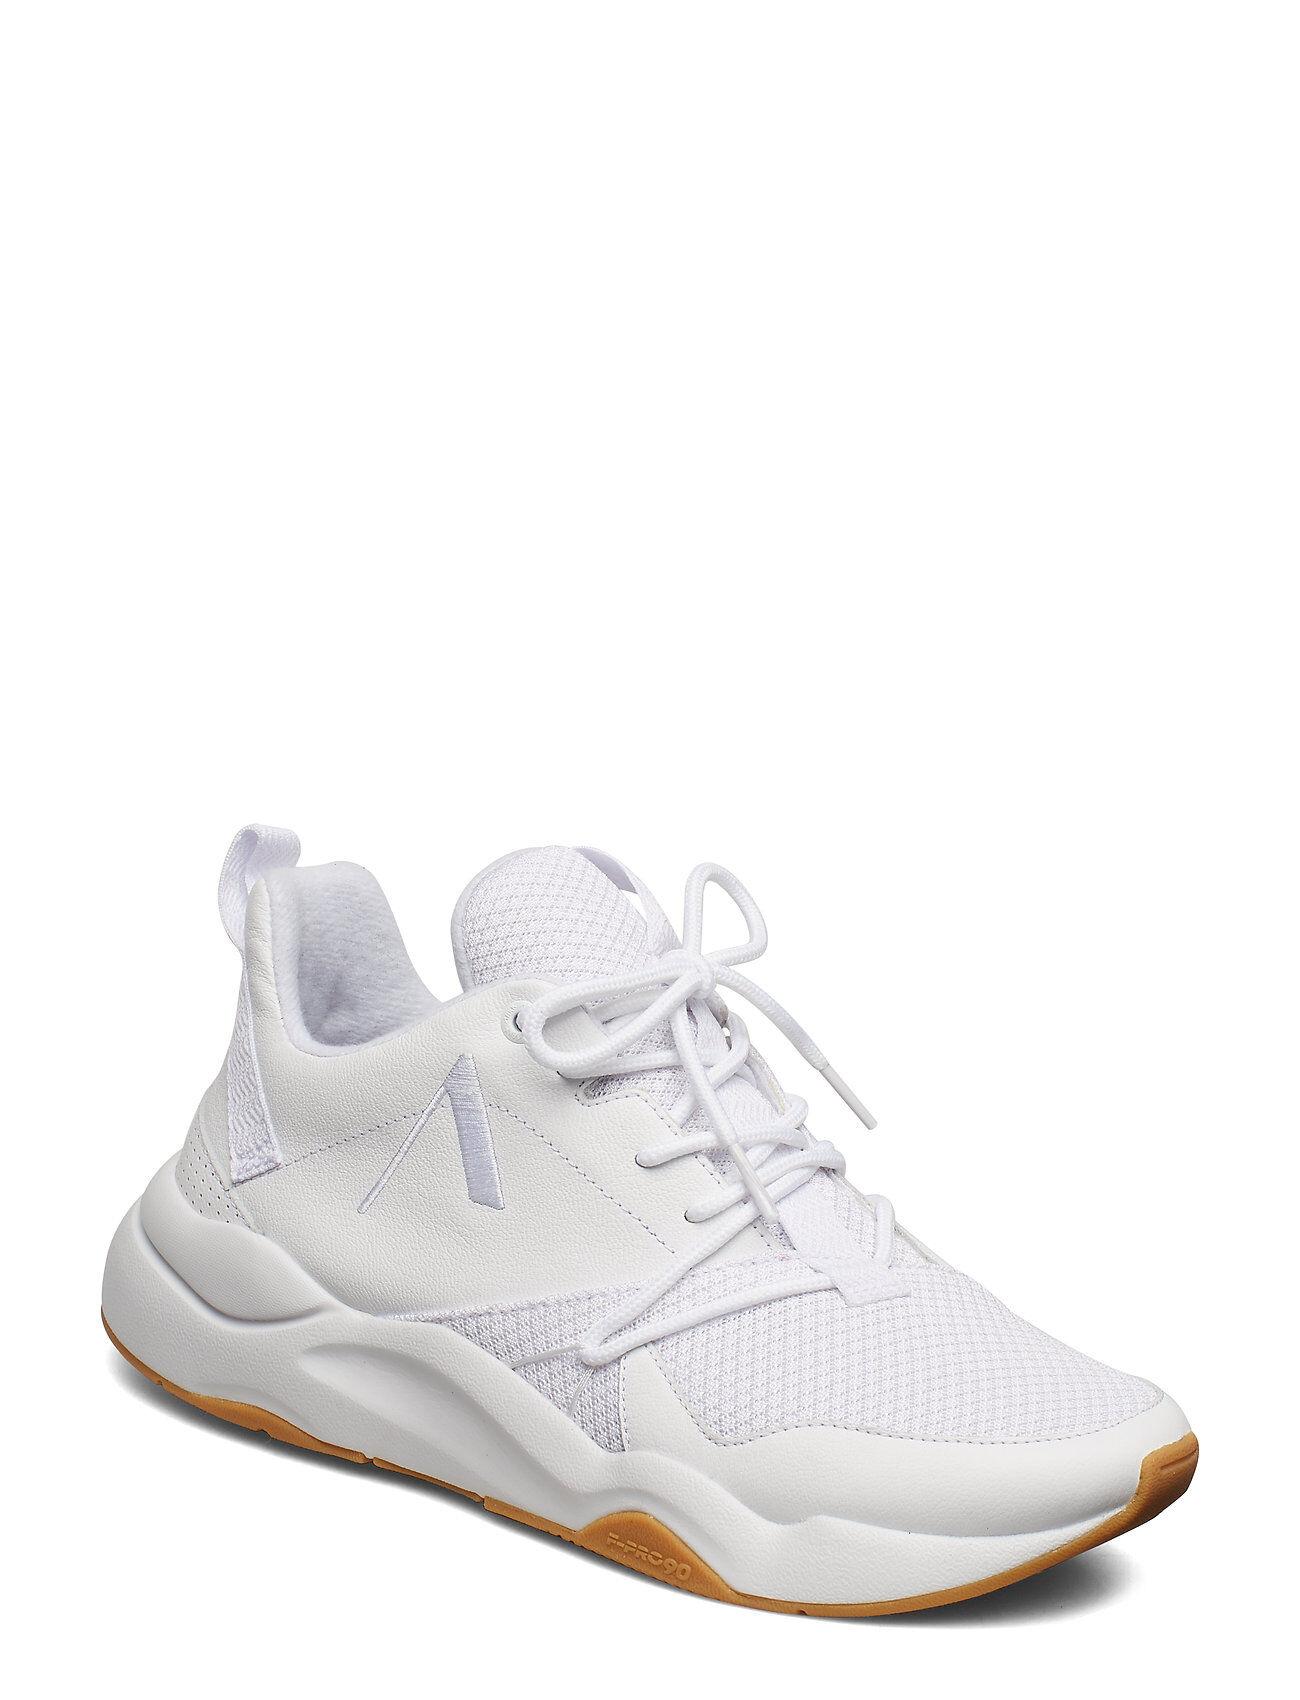 ARKK Copenhagen Asymtrix Mesh F-Pro90 All White Lig Matalavartiset Sneakerit Tennarit Valkoinen ARKK Copenhagen